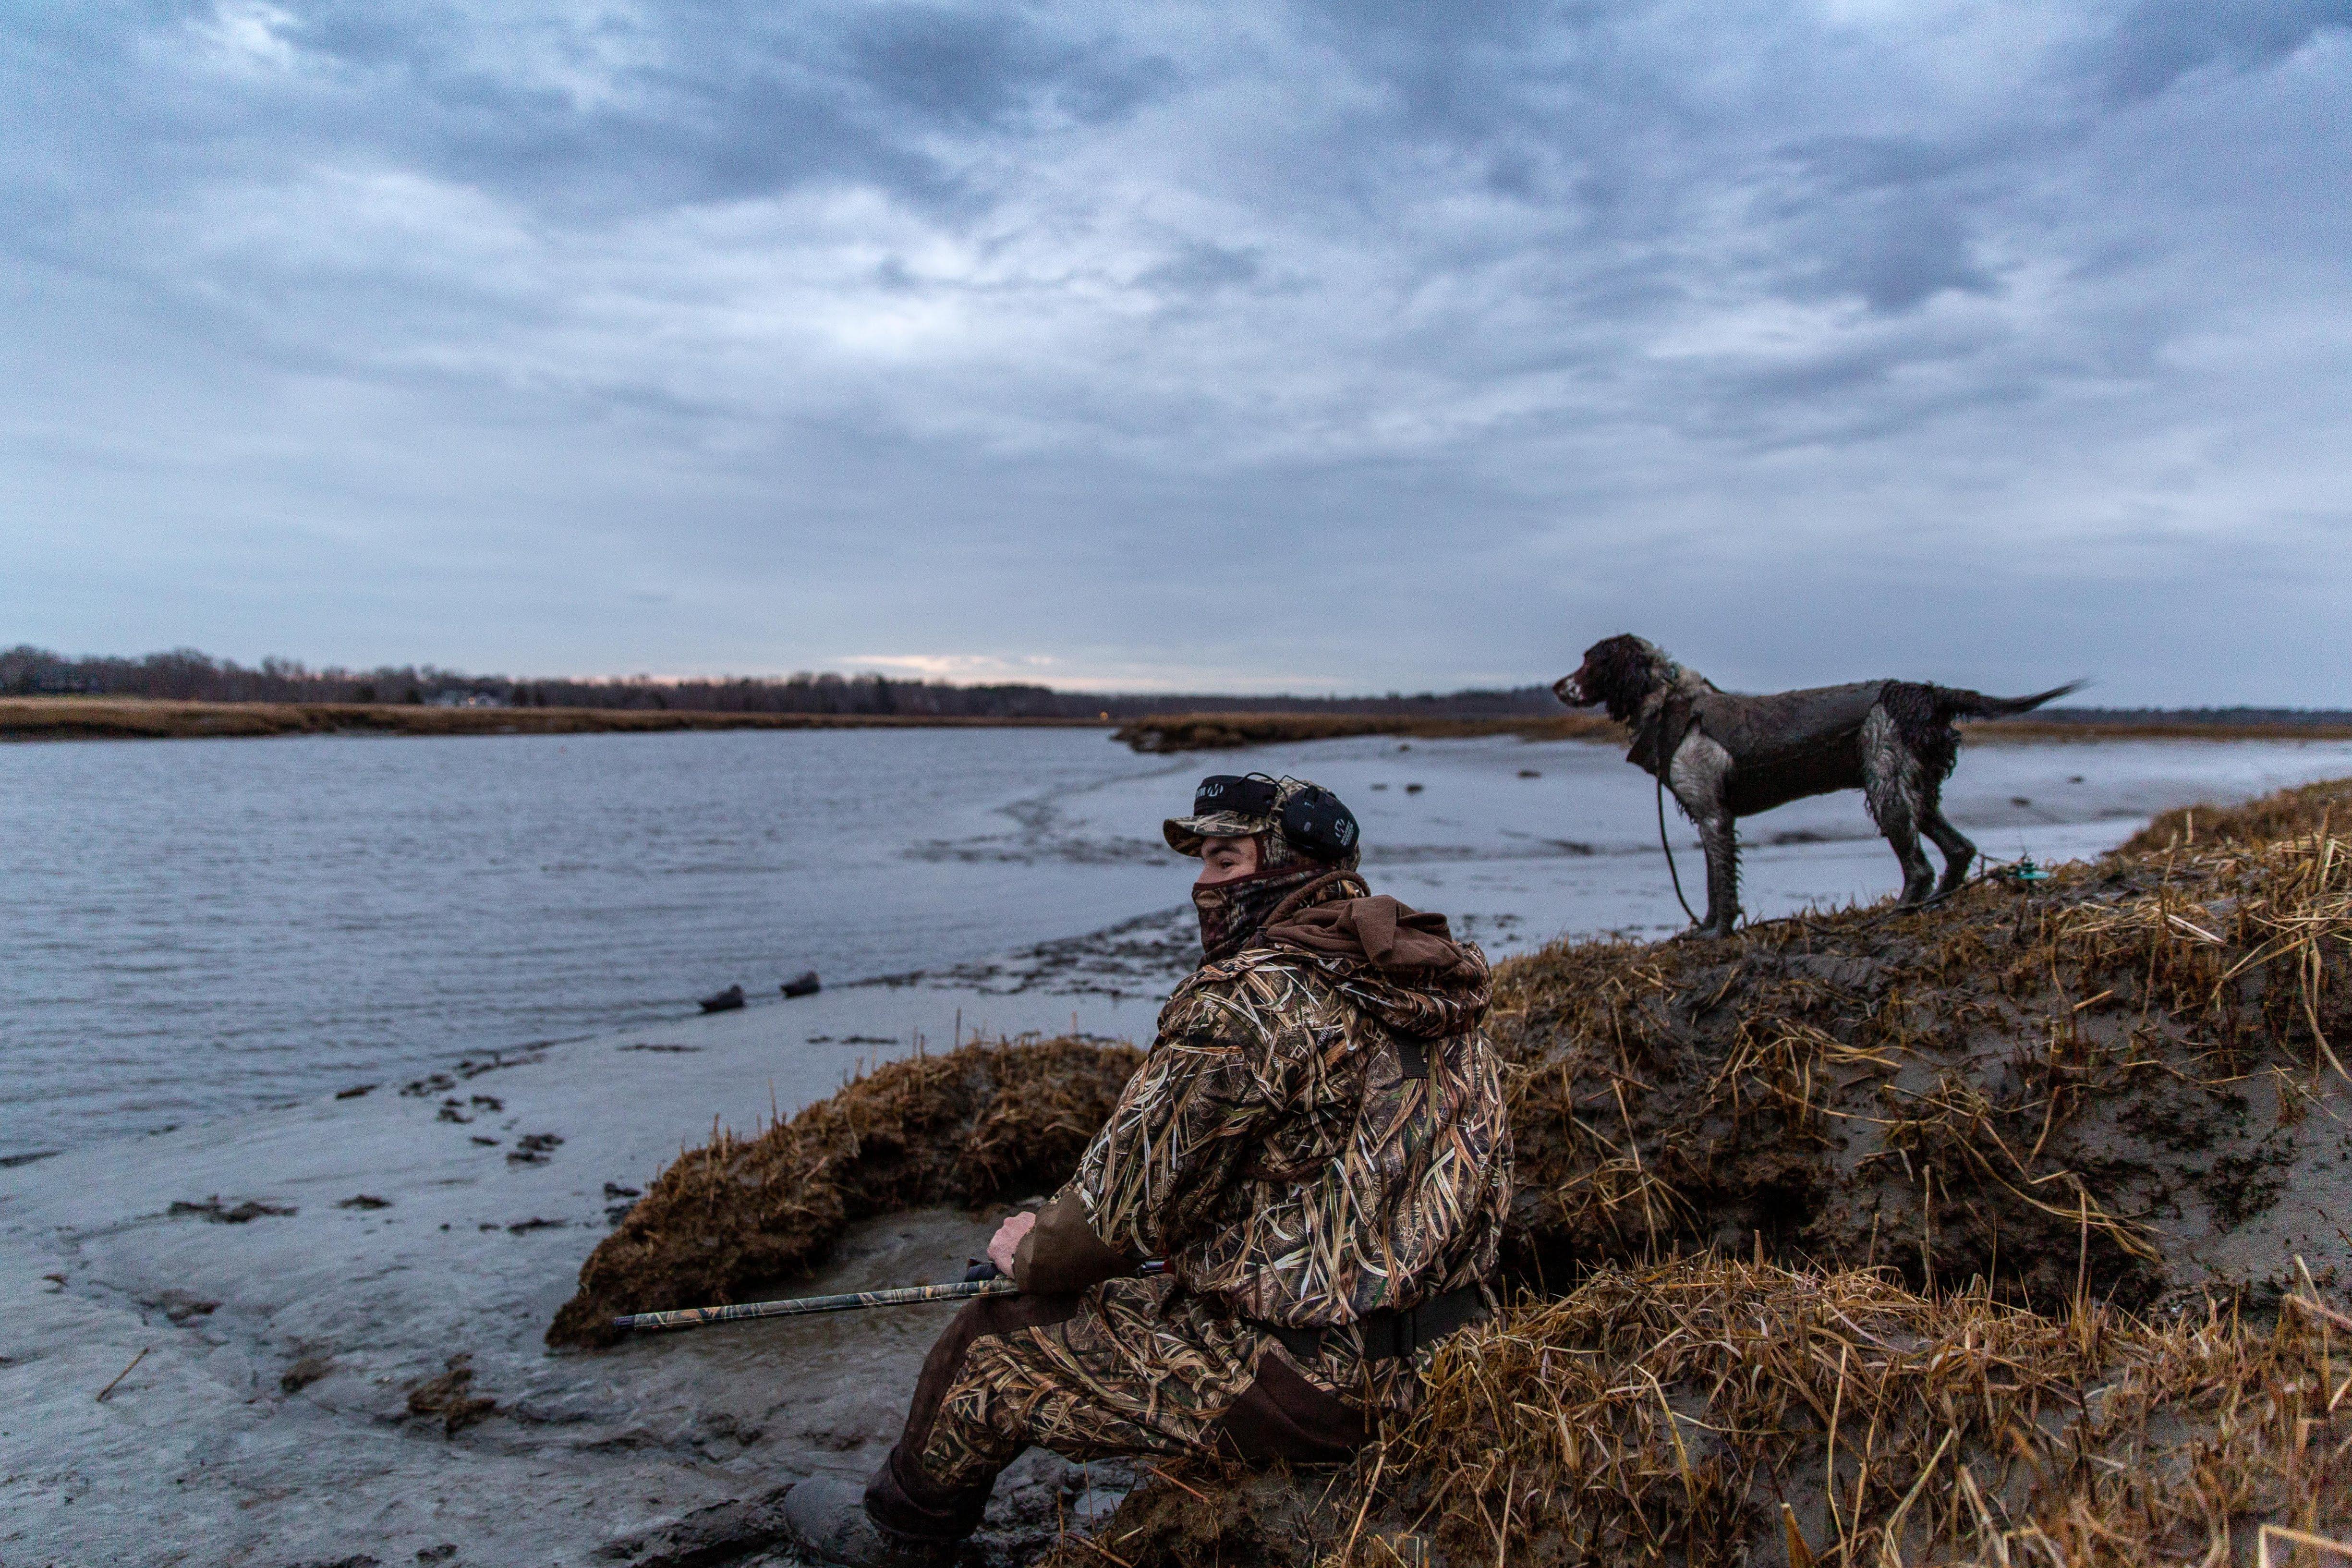 Duck_Hunting_Jan_2020-2.jpg